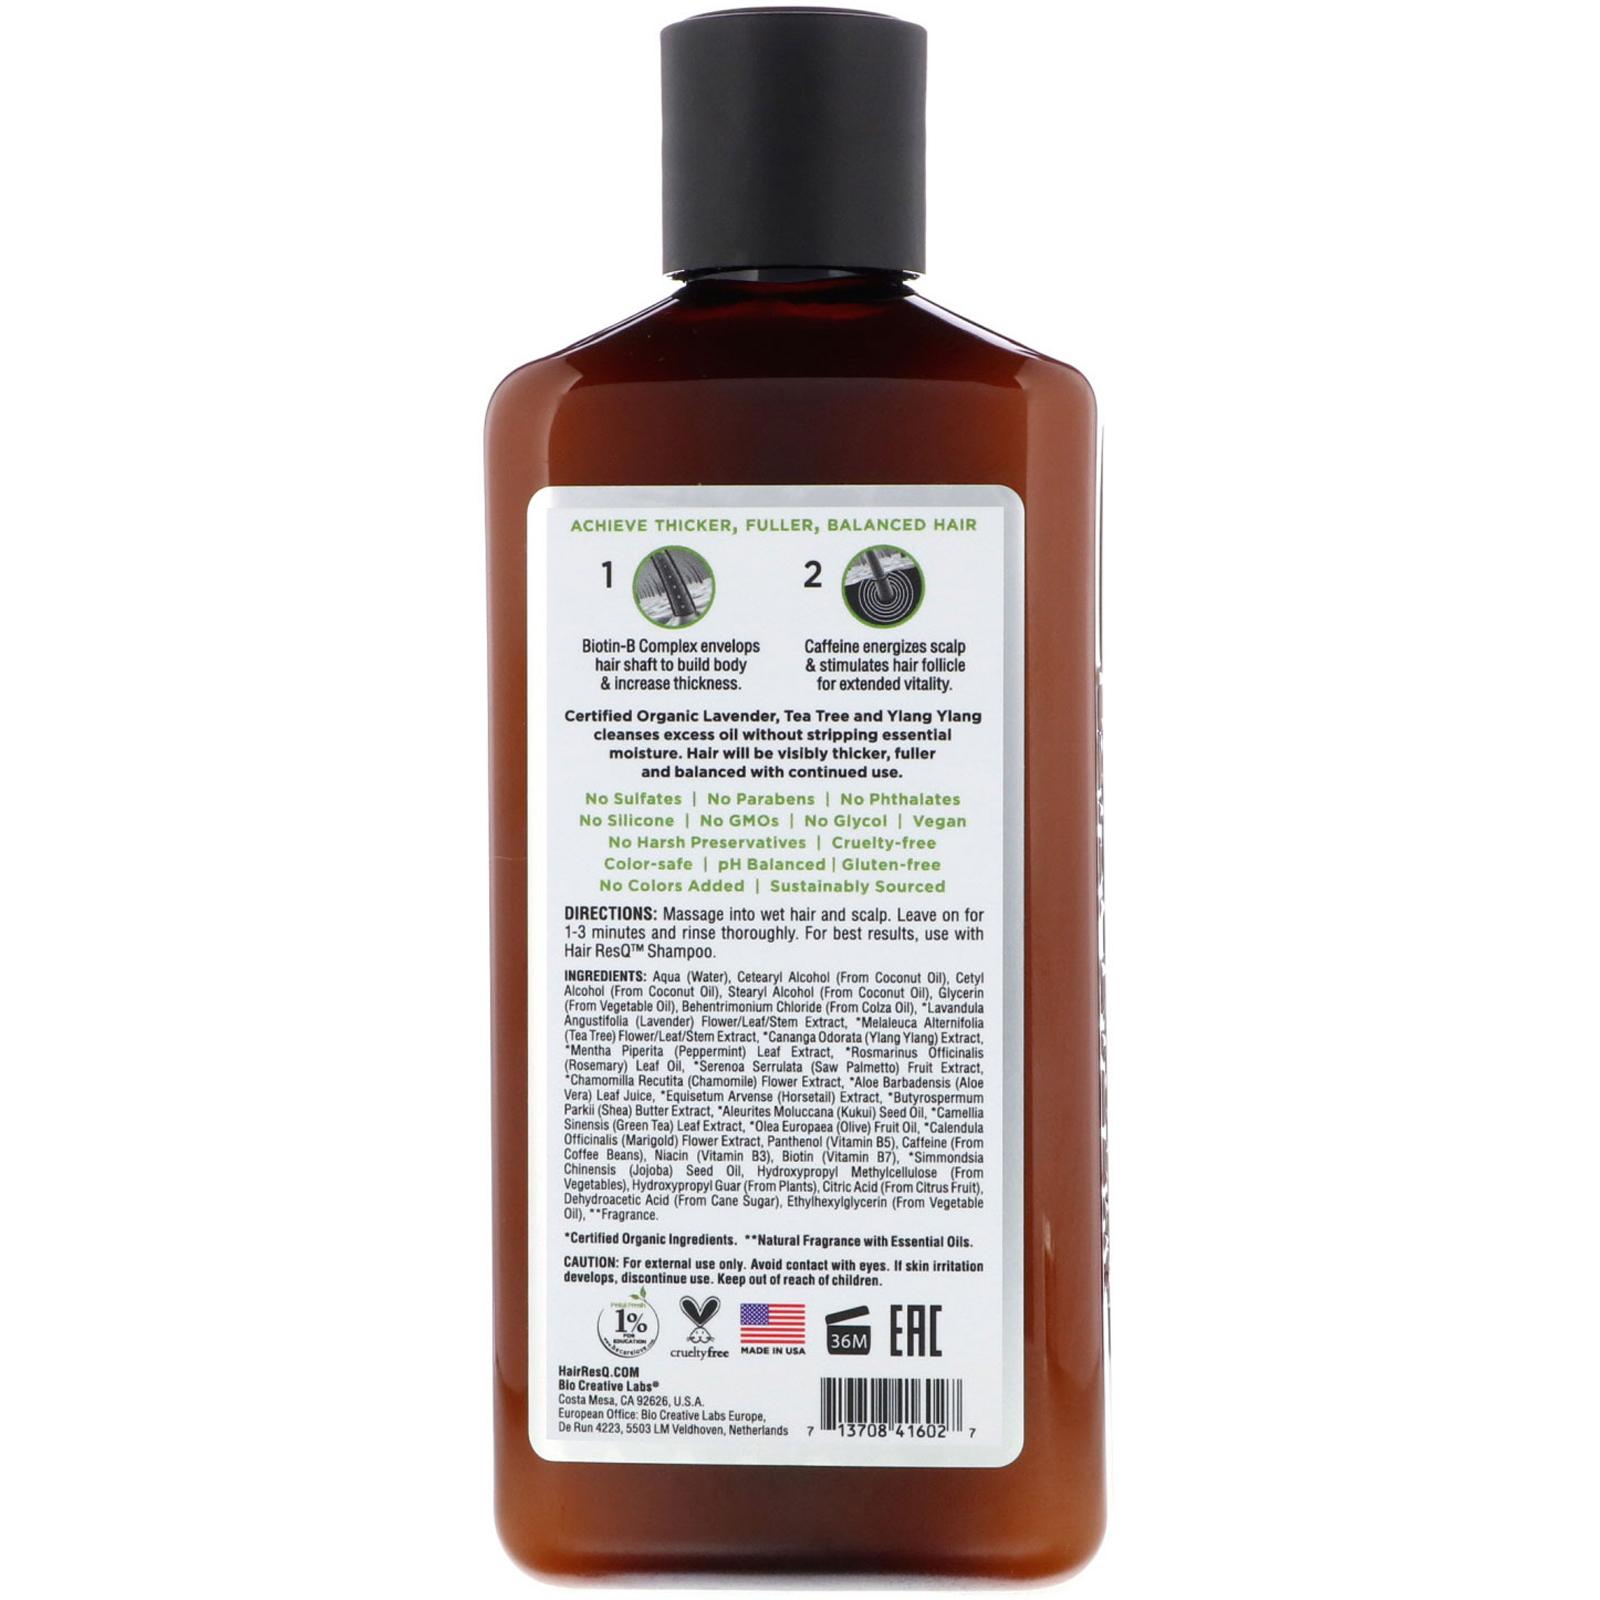 ebbf6c56c Petal Fresh, Pure, Hair ResQ, Thickening Treatment Conditioner, Oil ...